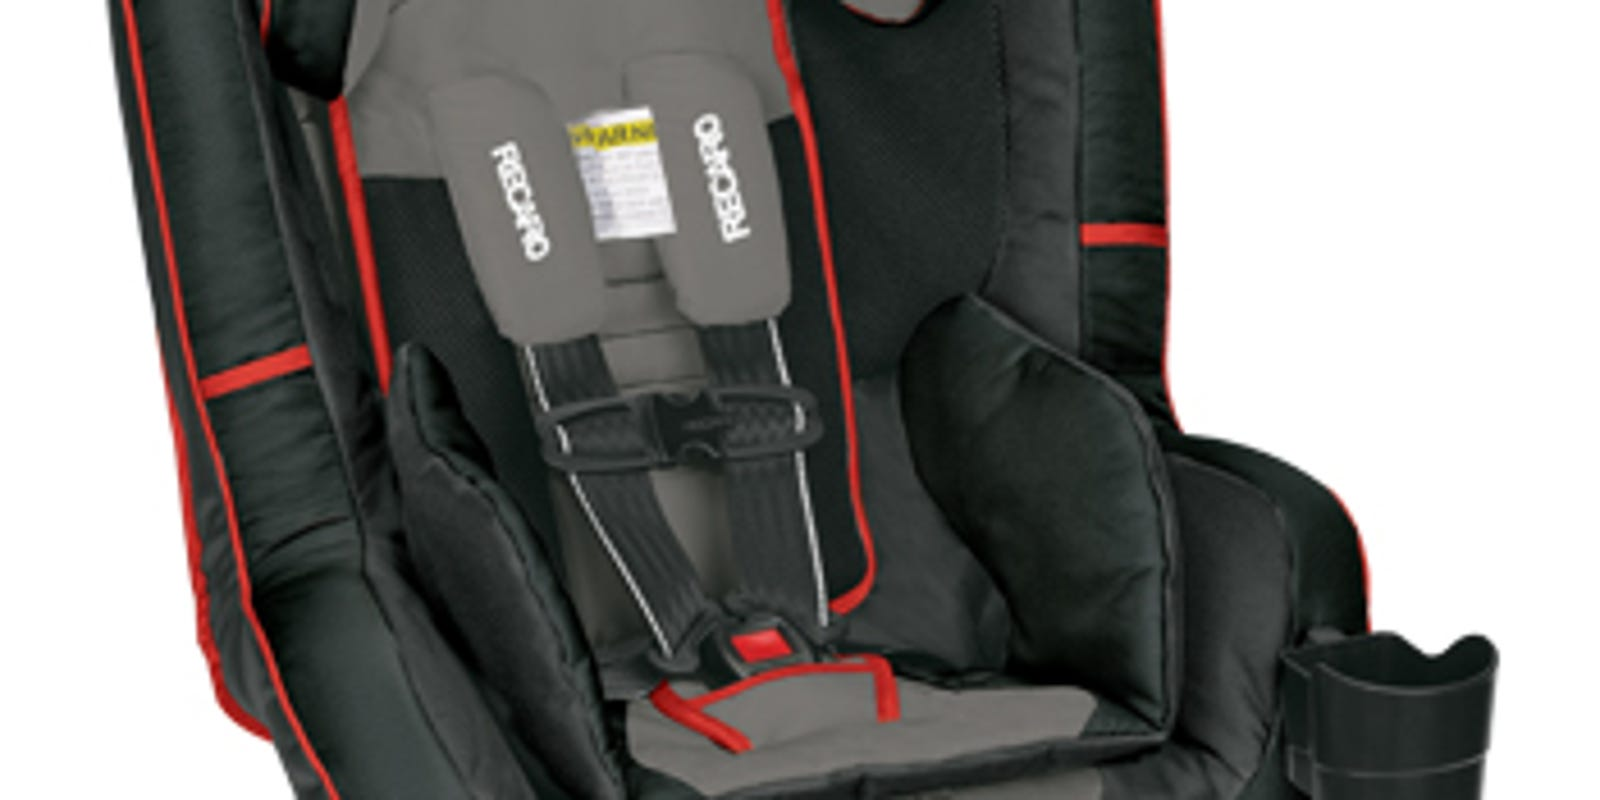 recaro recalls child car seats top tether can come loose. Black Bedroom Furniture Sets. Home Design Ideas